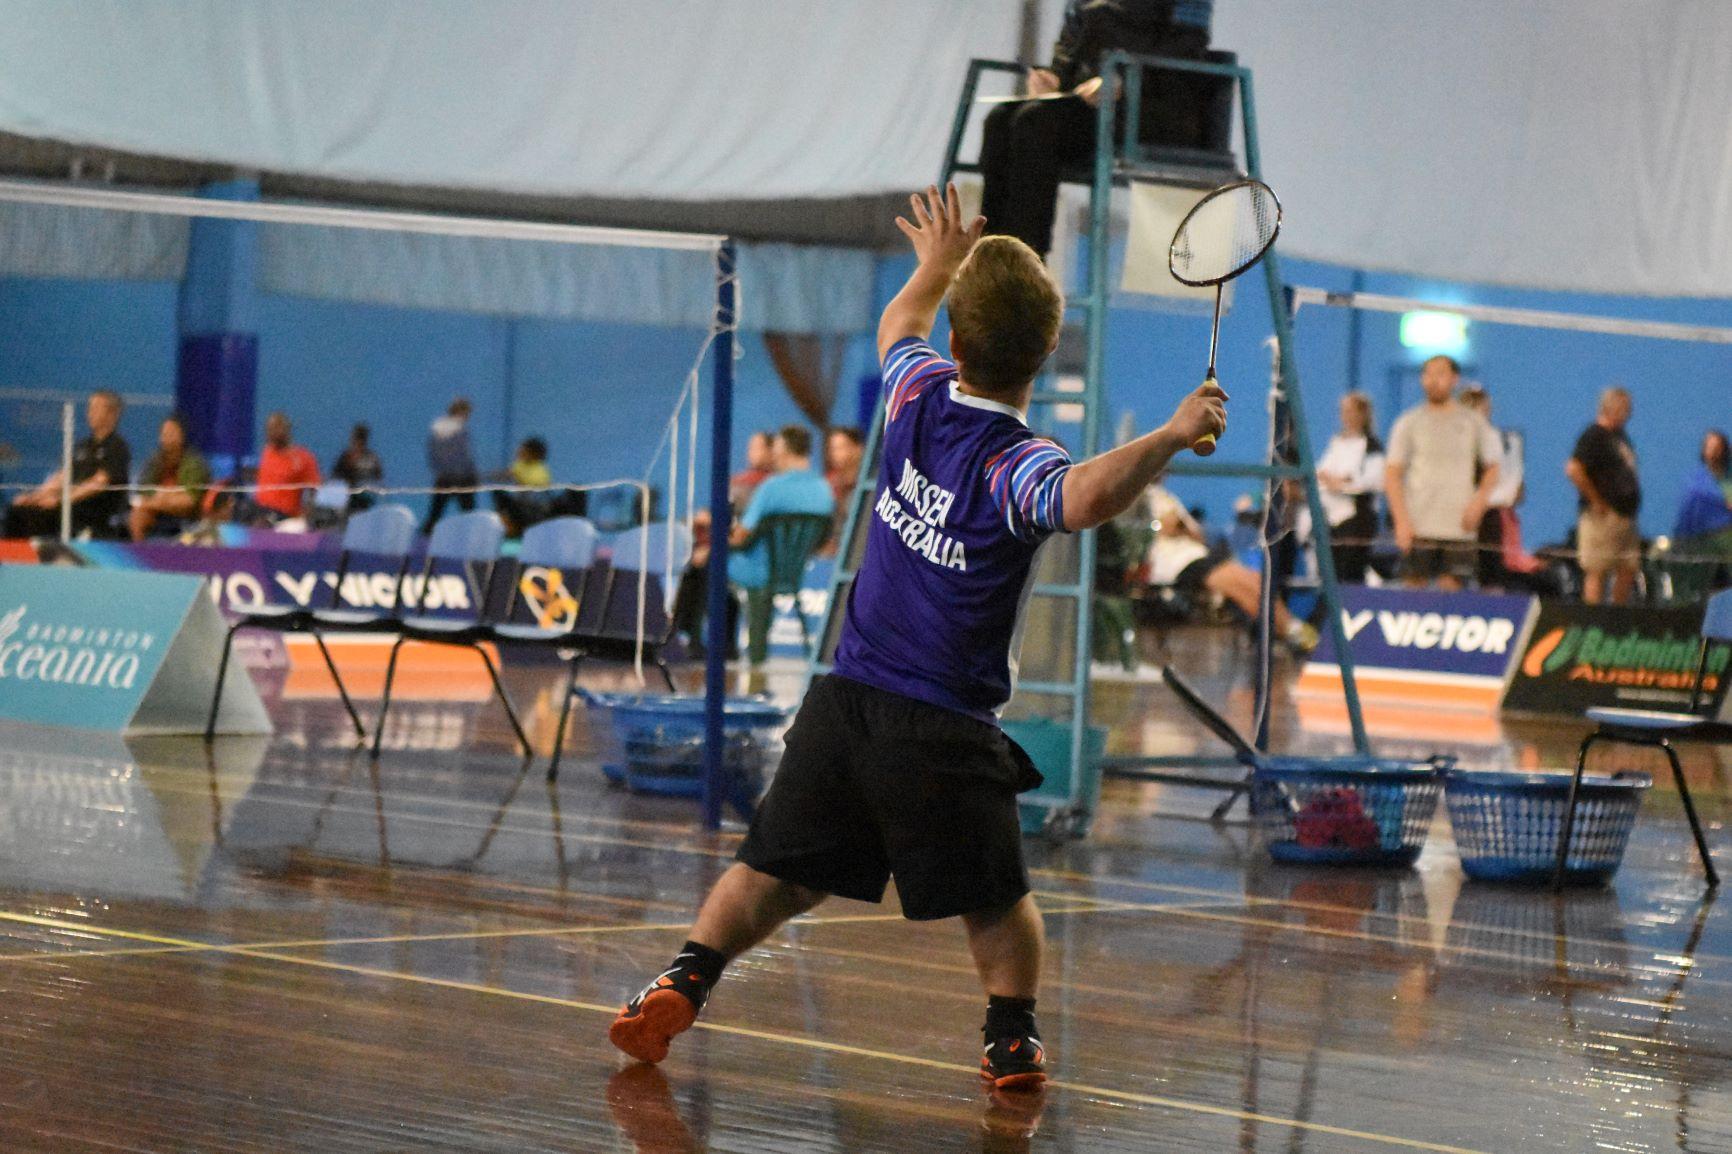 Australia win Oceania Men's and Women's Team Badminton Championships